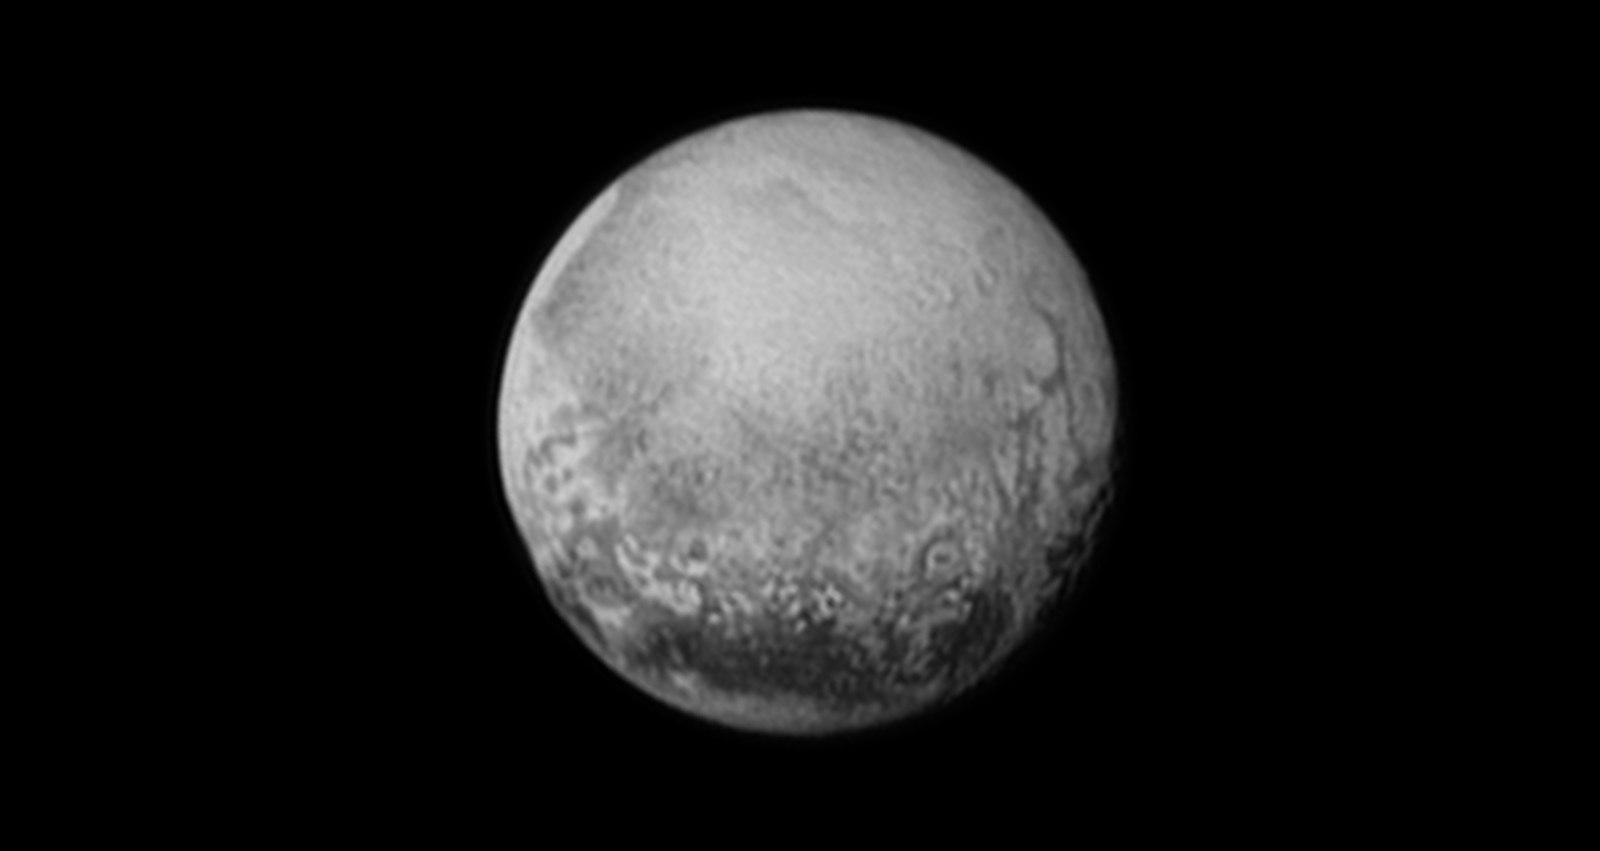 nasa new horizons pluto pictures - HD1600×851